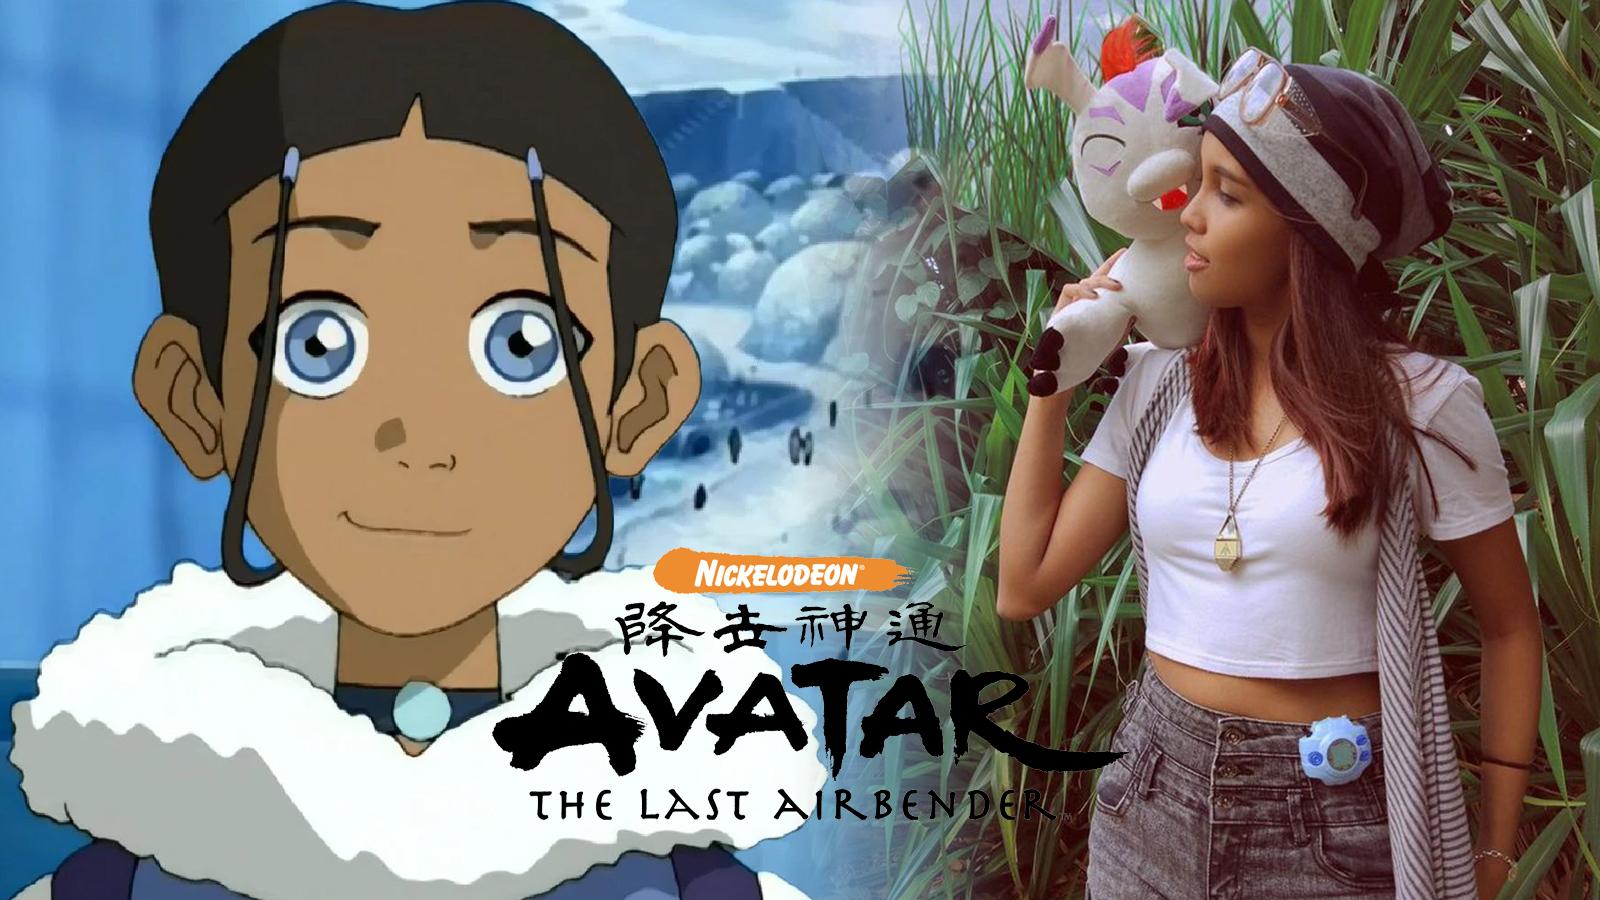 Katara Avatar The Last Airbender Cosplay